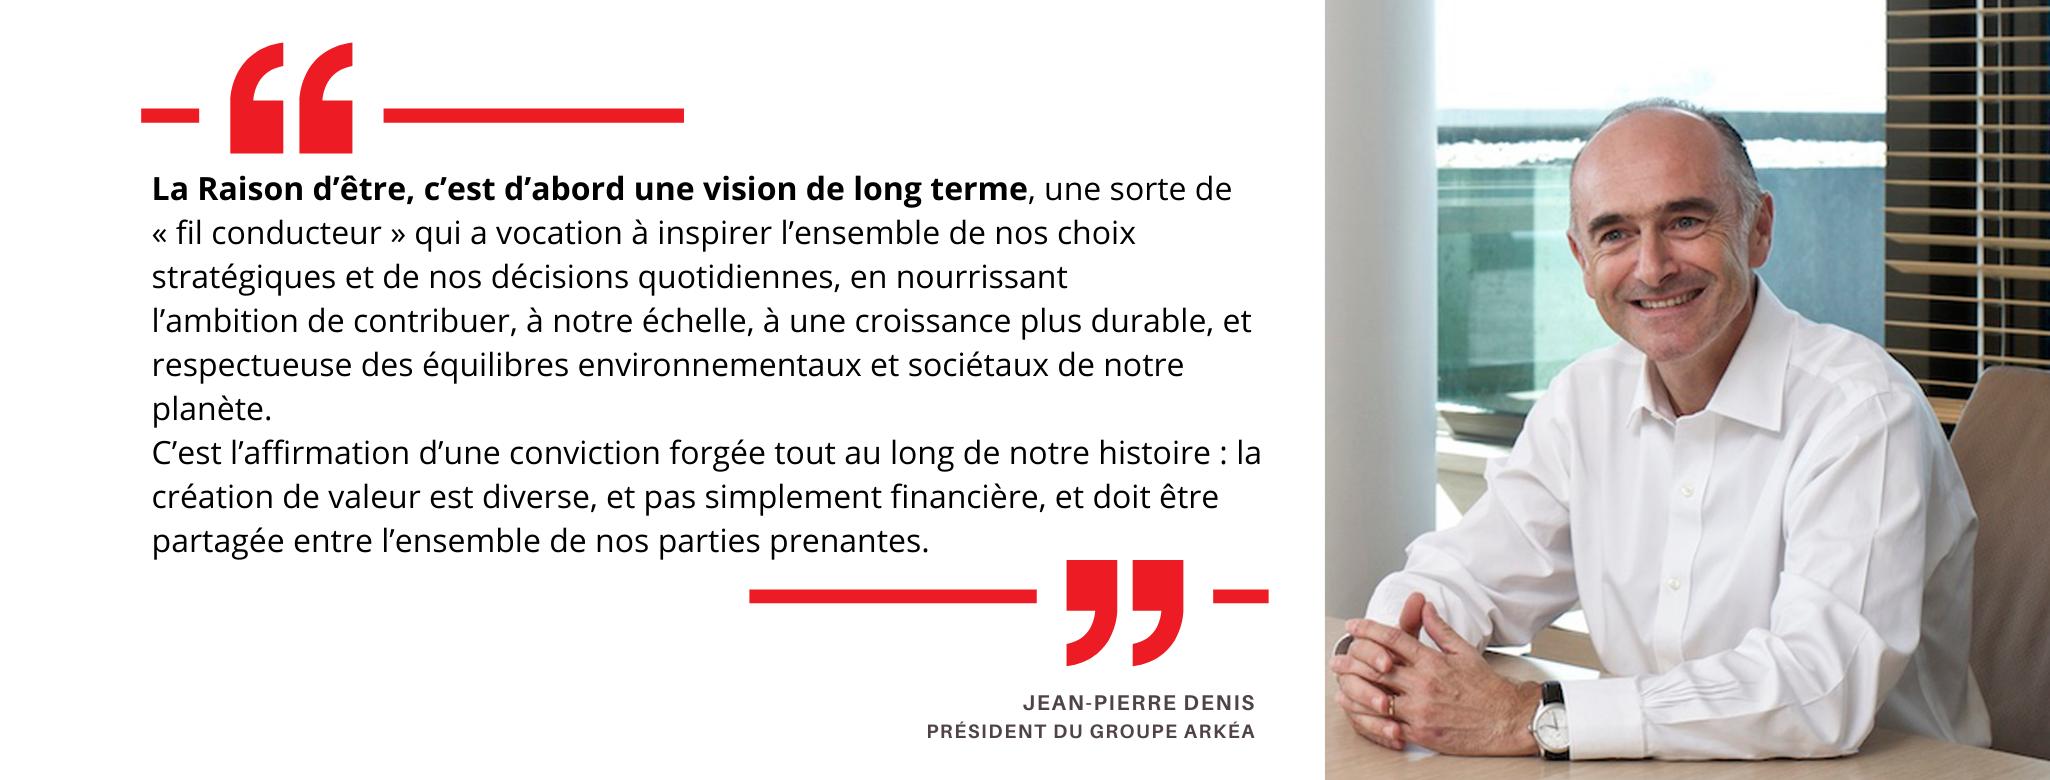 Verbatim de Jean-Pierre Denis, Président du groupe Arkéa